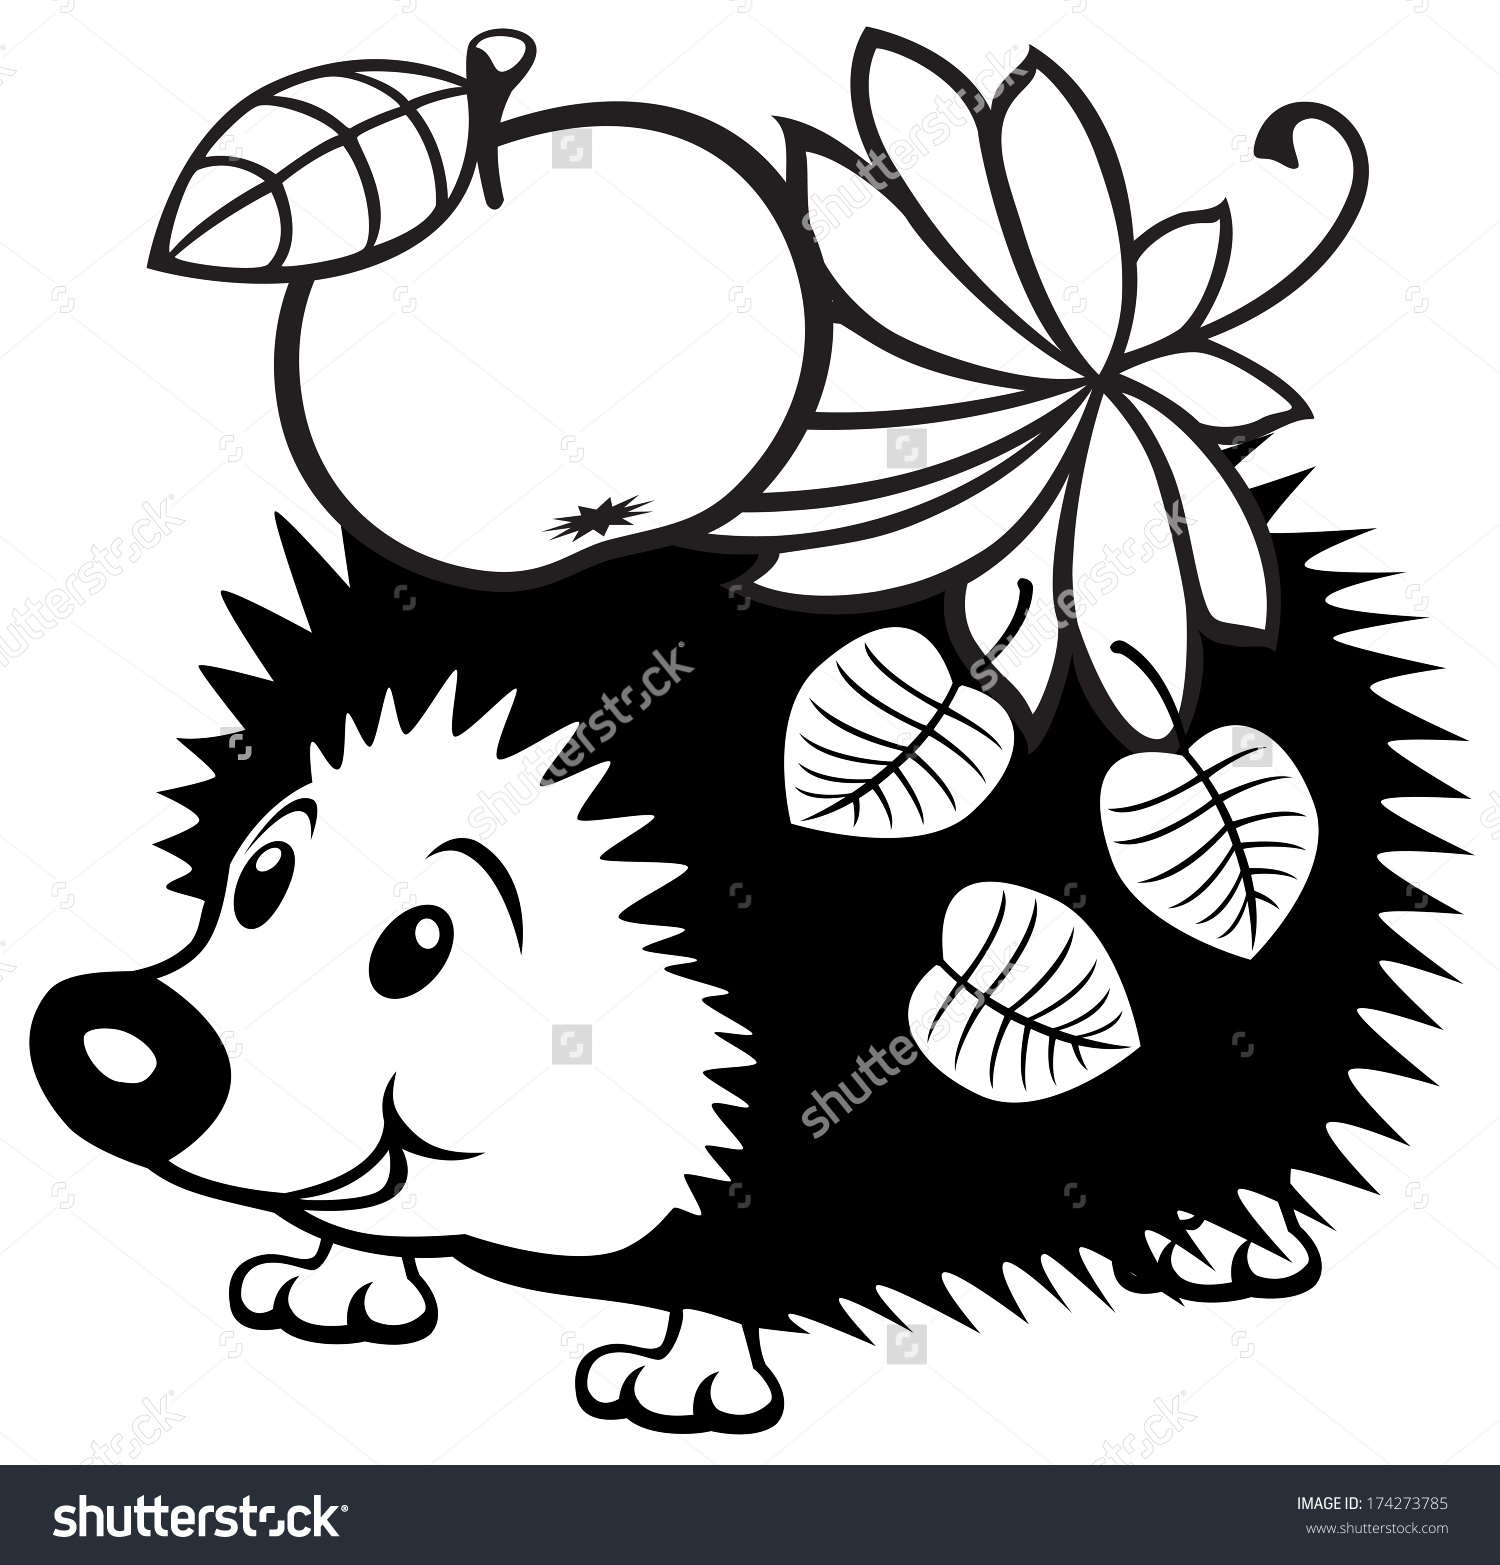 Cartoon Hedgehog Black White Picture Little Stock Vector 174273785.